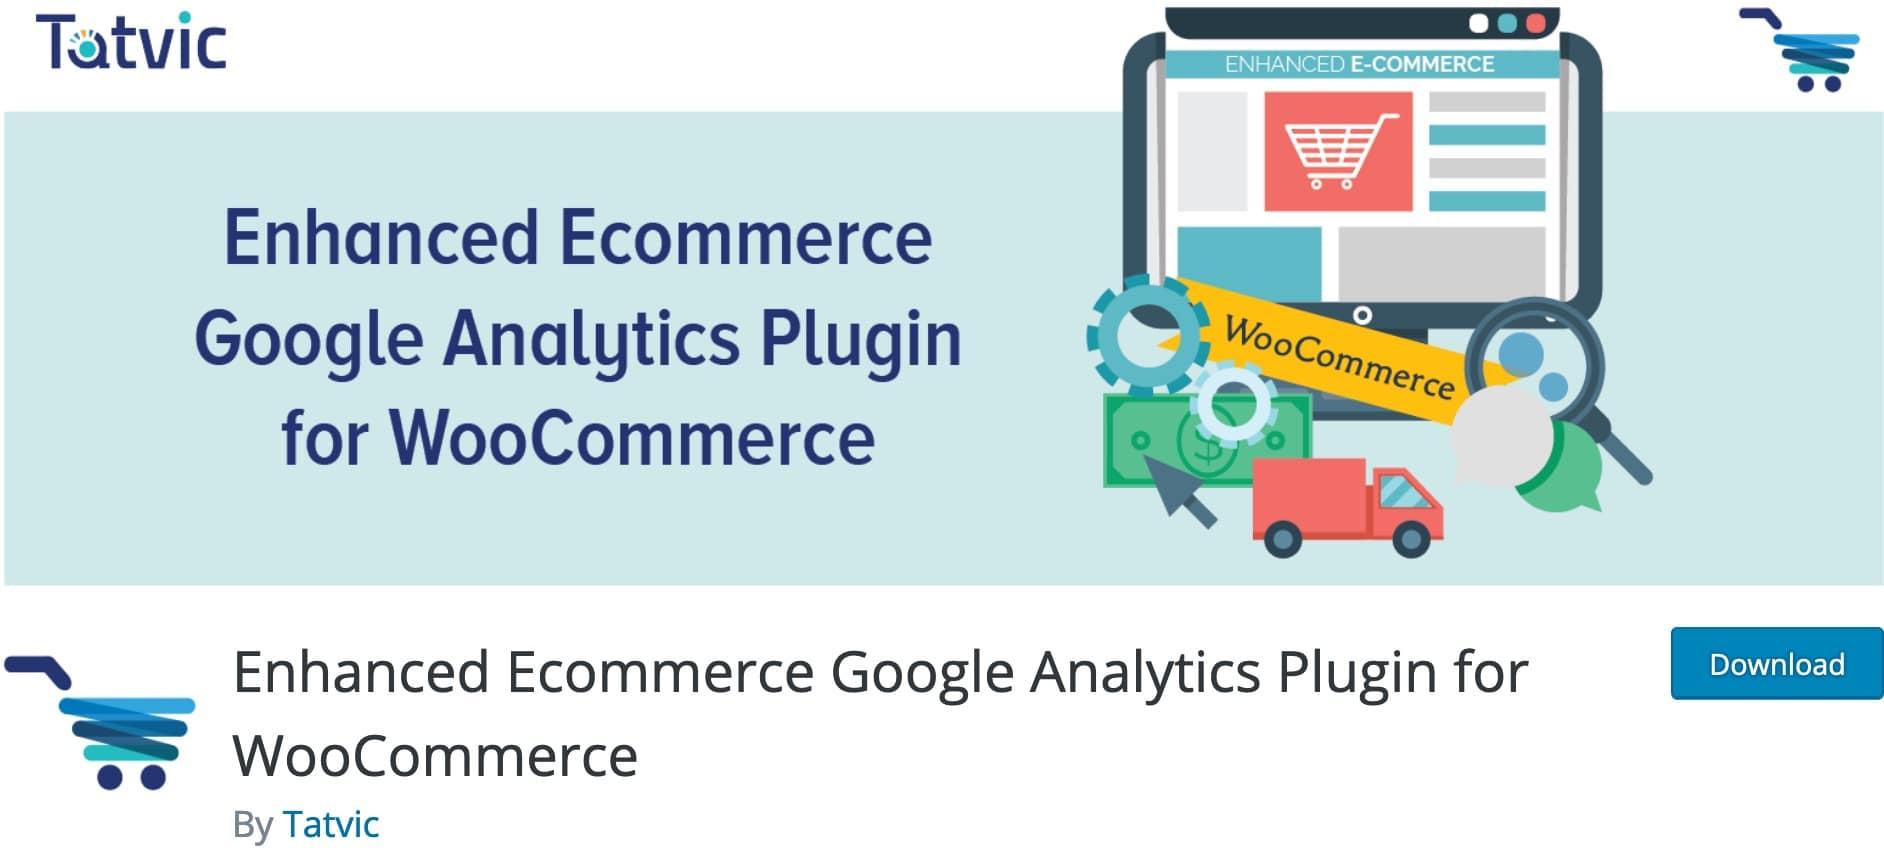 Enhanced Ecommerce Google Analytics Plugin for WooCommerce, Plugin Gratuit Woocommerce WordPress